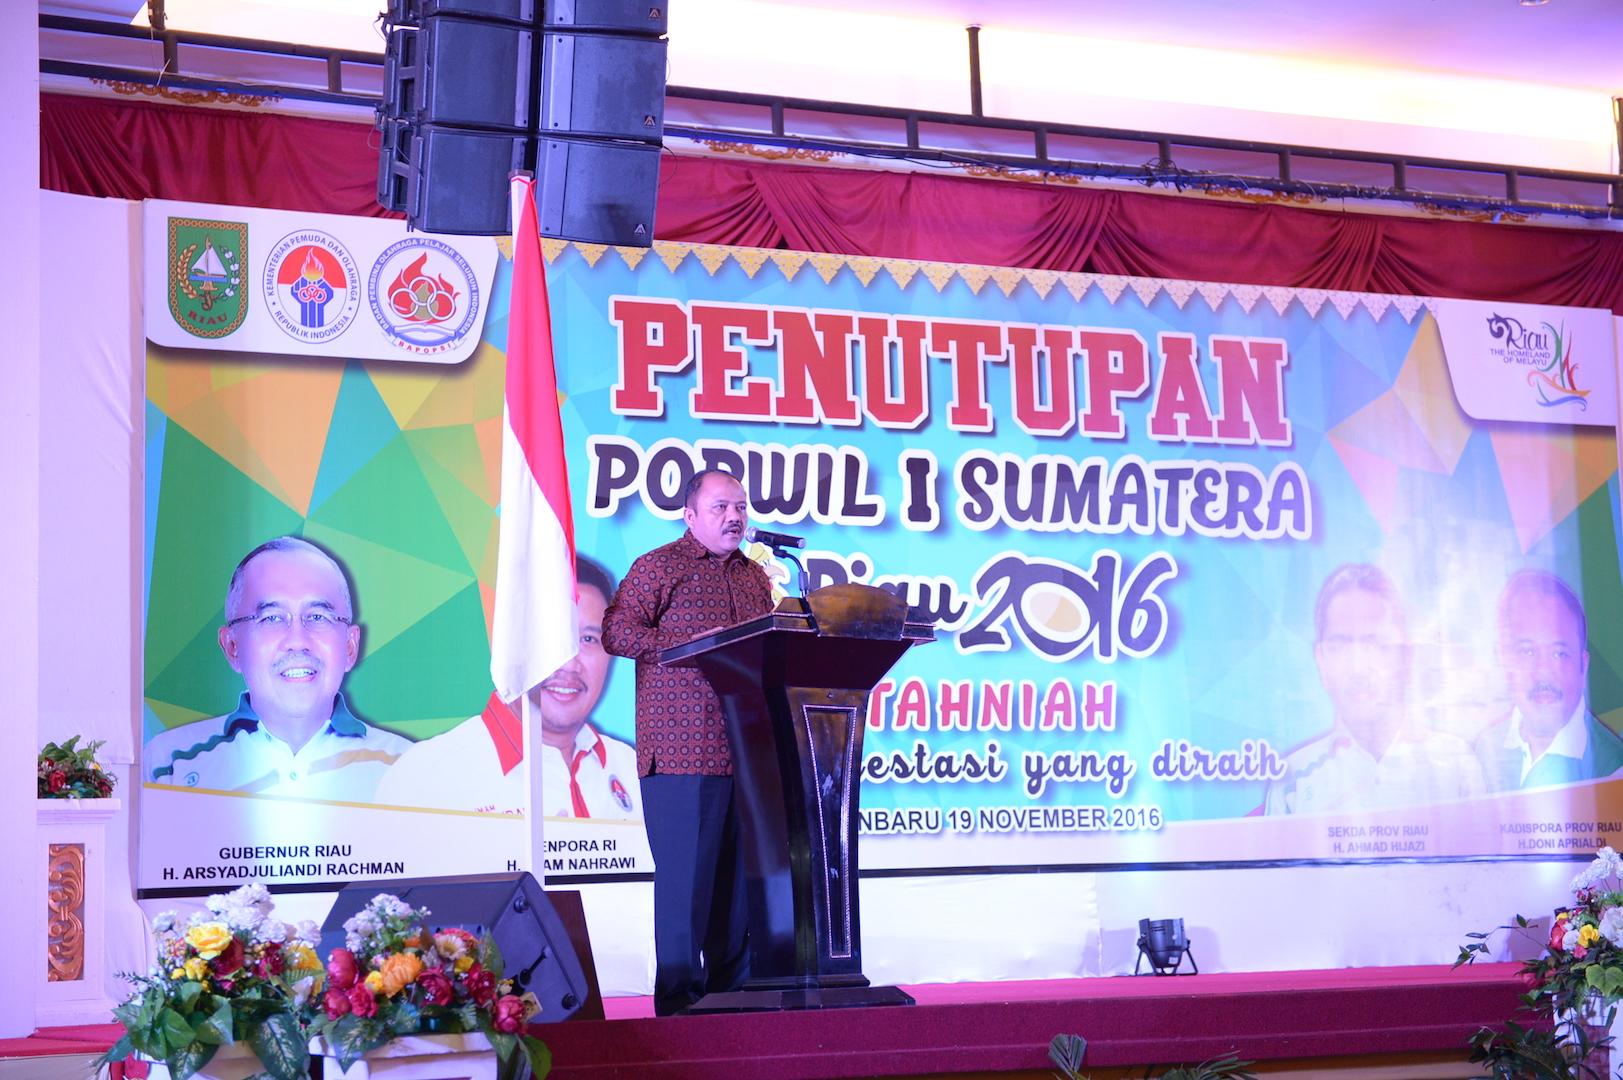 Permalink ke Penutupan Popwil I Sumatra Riau 2016